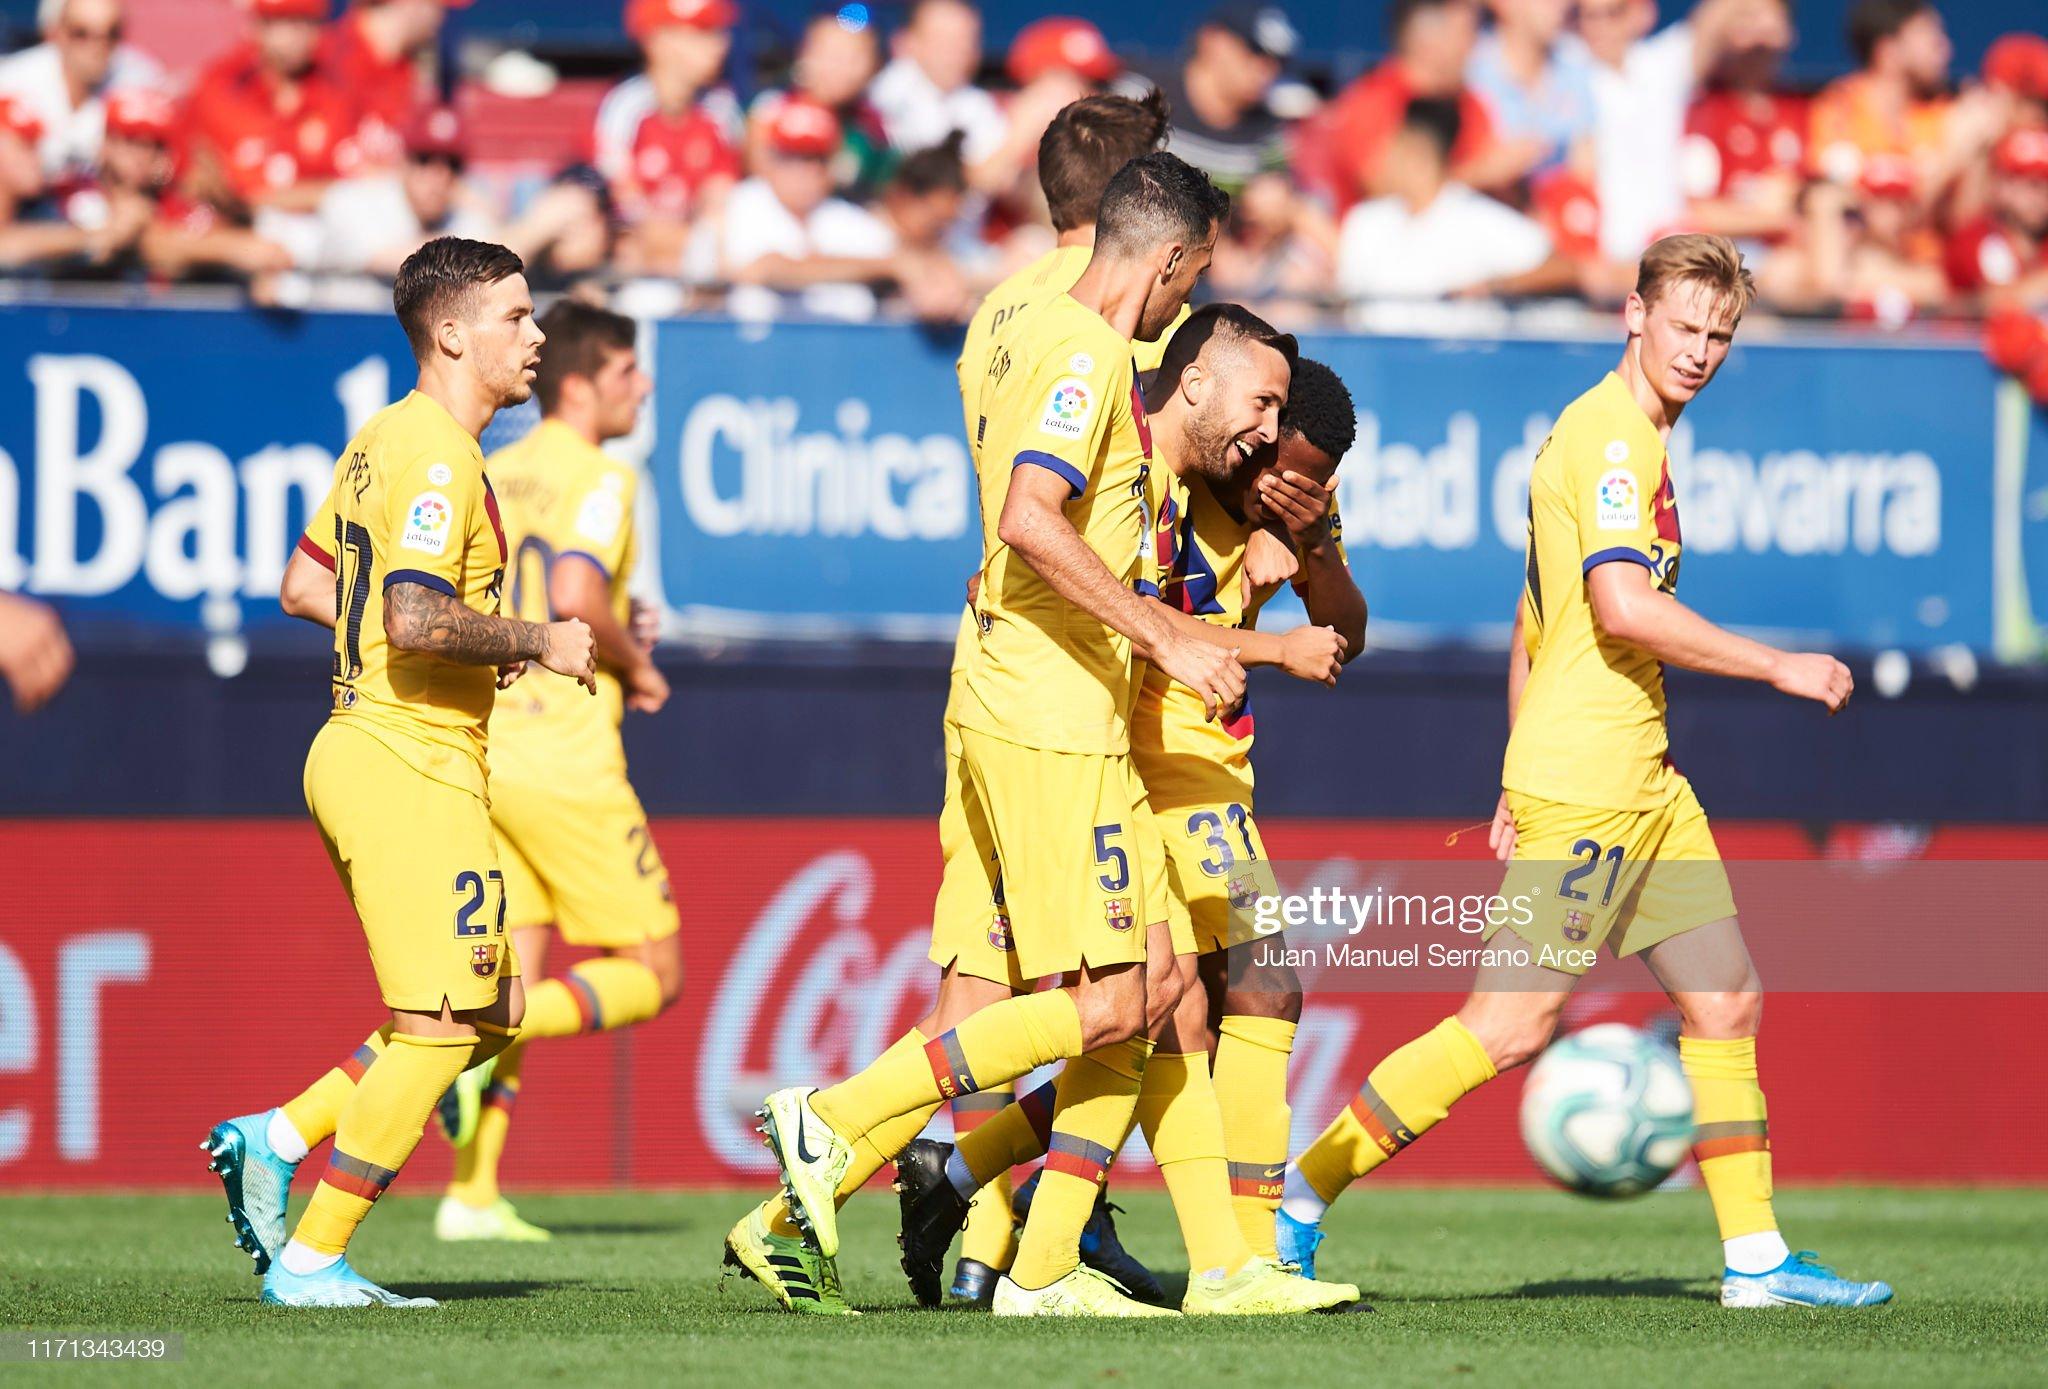 صور مباراة : أوساسونا - برشلونة 2-2 ( 31-08-2019 )  Anssumane-fati-of-fc-barcelona-celebrates-with-teammates-jordi-alba-picture-id1171343439?s=2048x2048